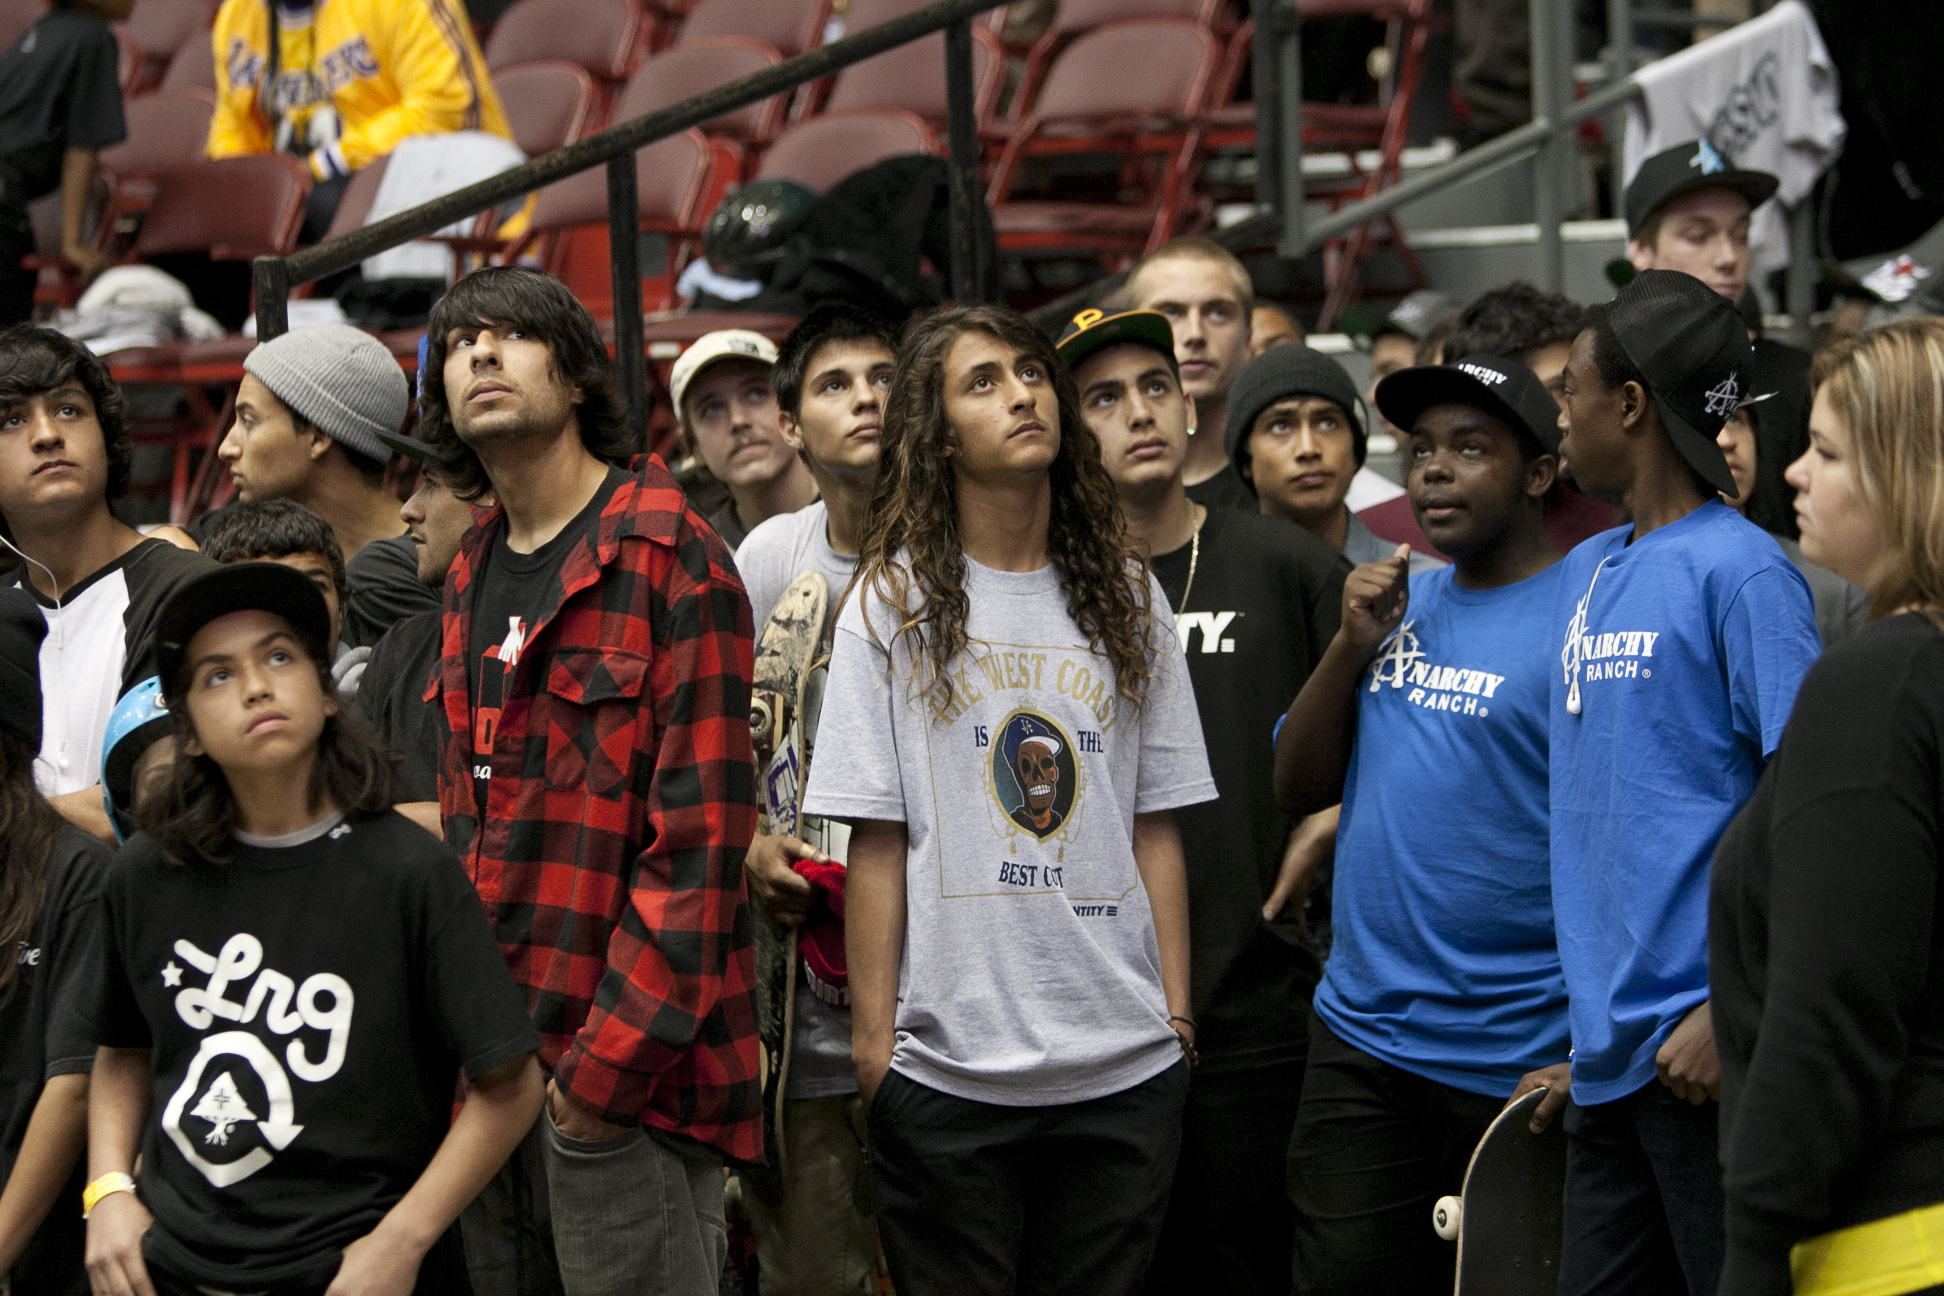 Elevated Skateboard Culture